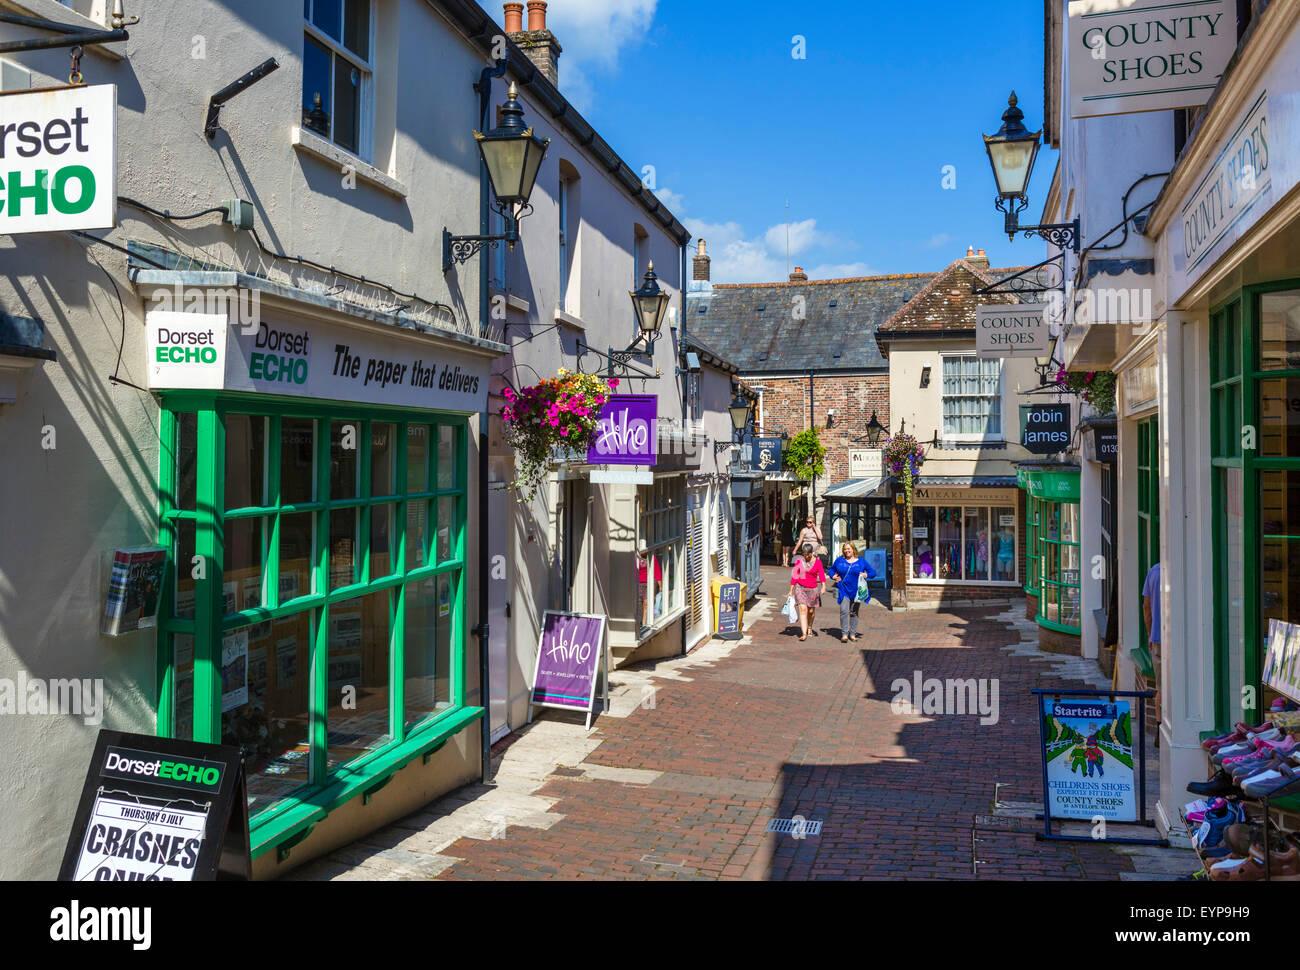 Shops on Antelope Walk in the town centre, Dorchester, Dorset, England, UK - Stock Image